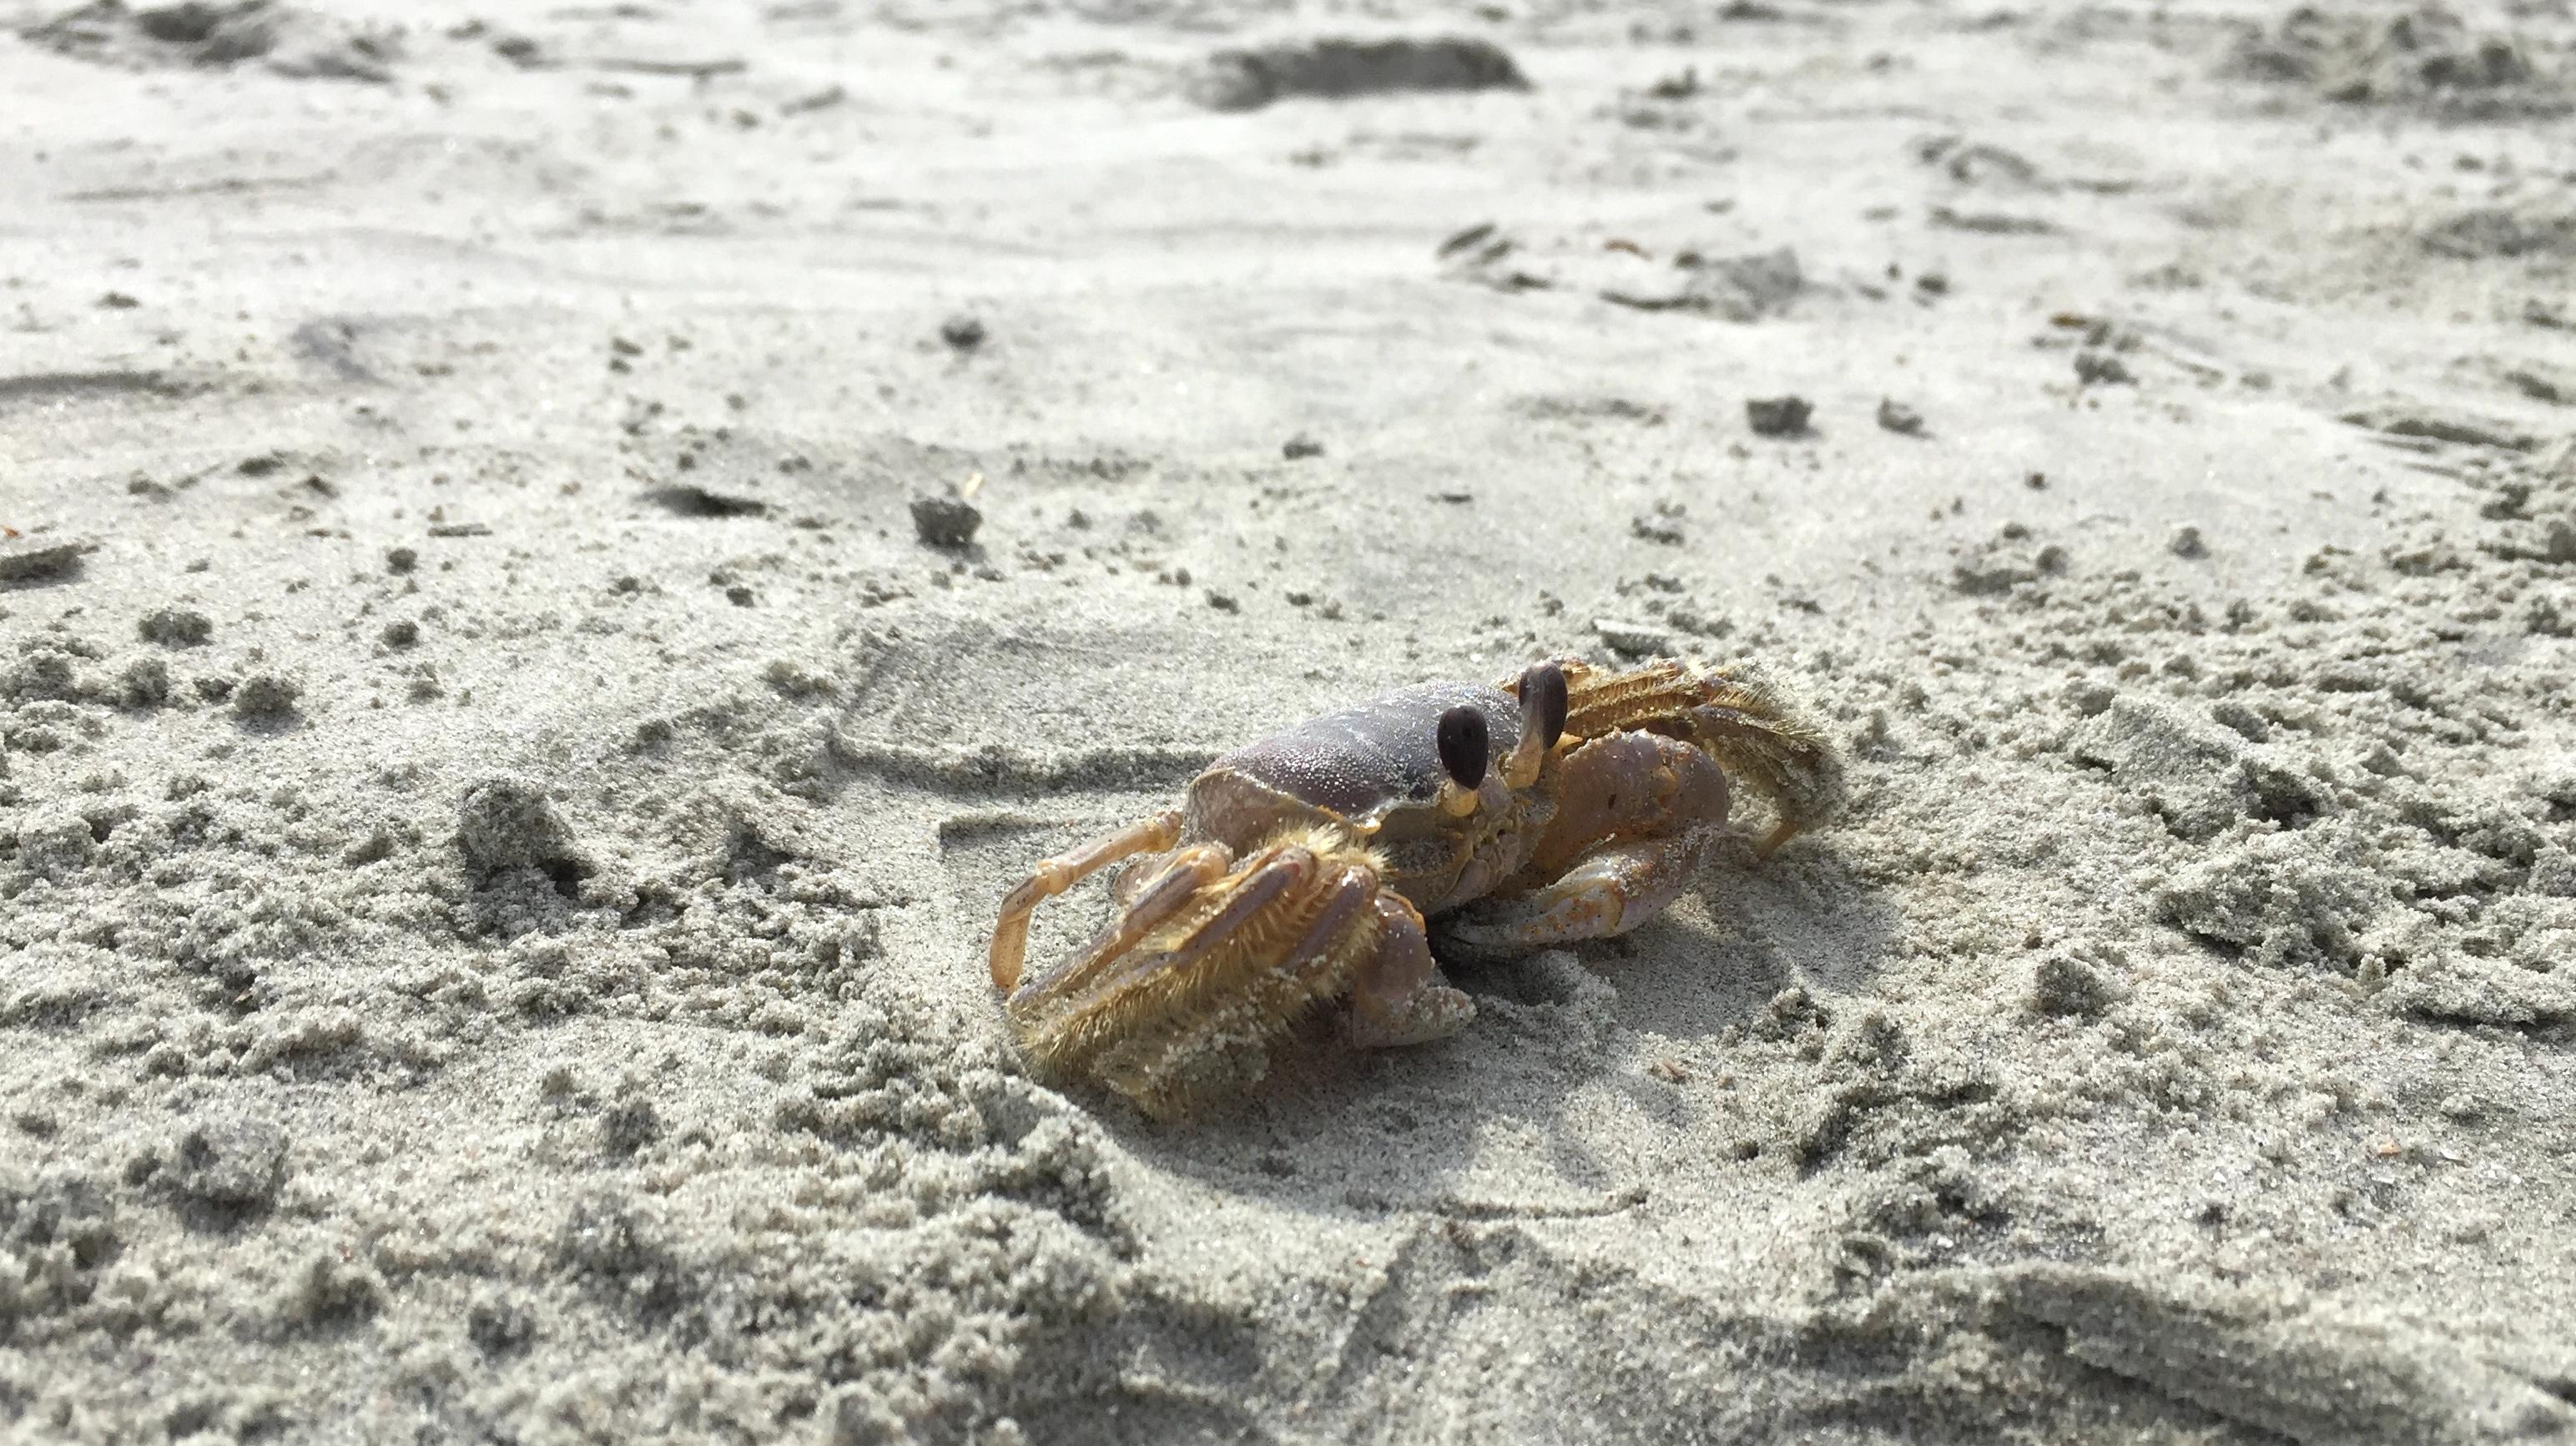 charleston crab on beach